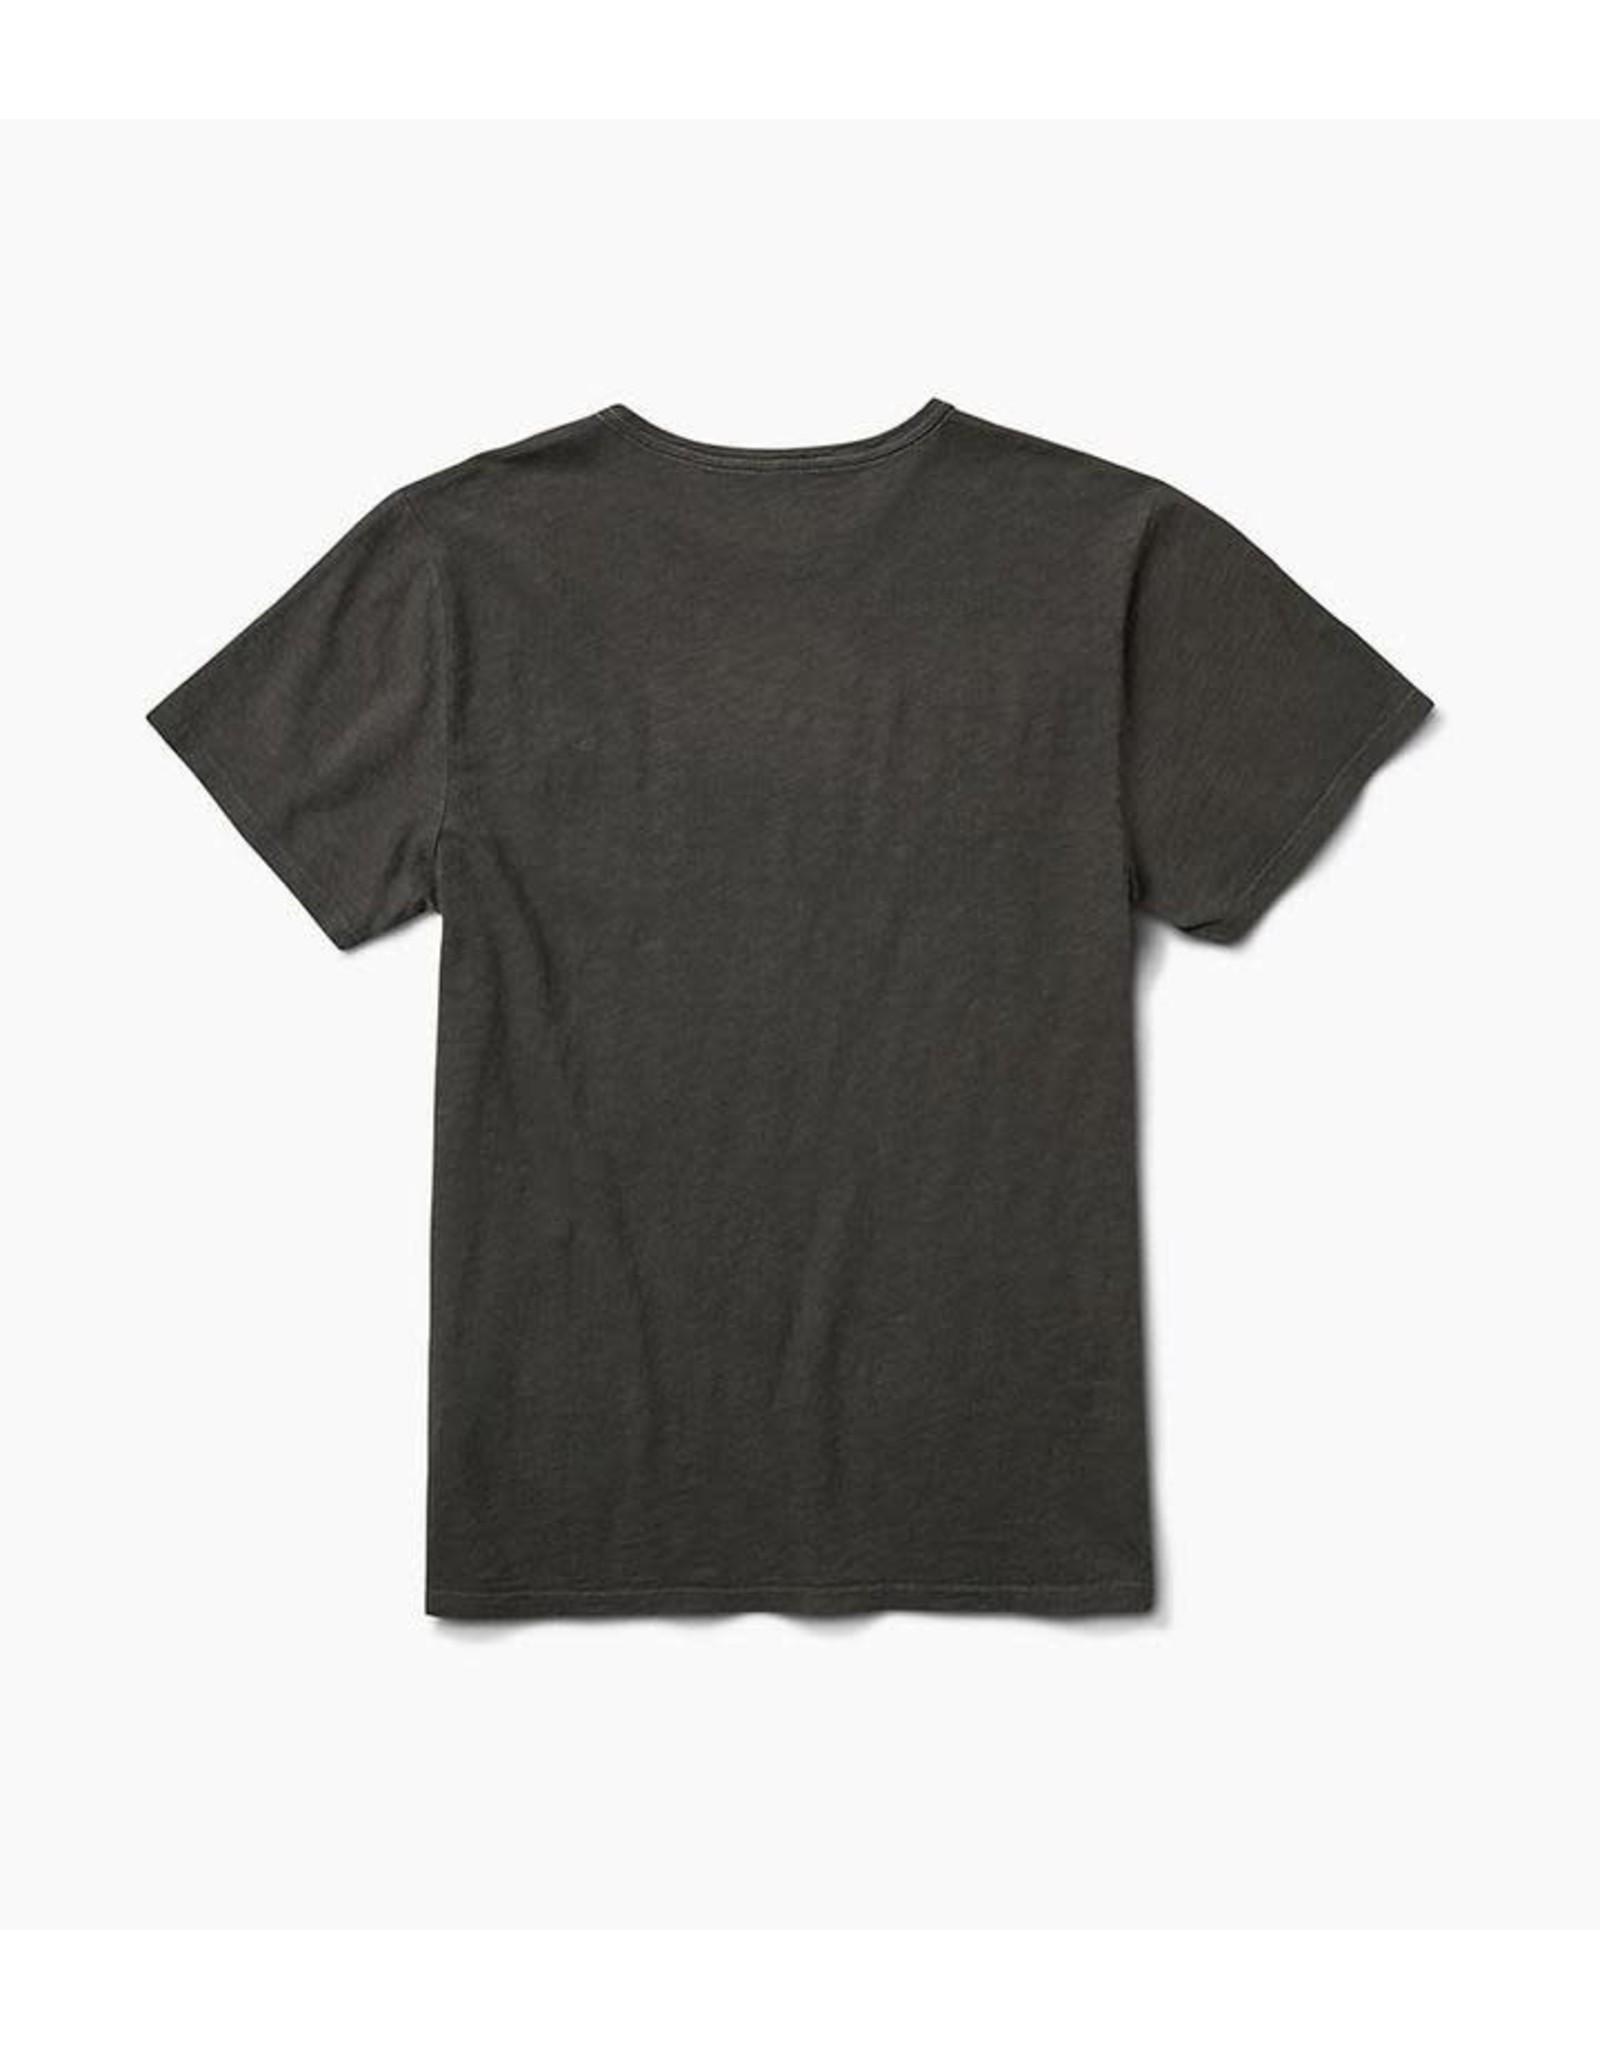 Roark Roark - T-shirt homme well worn midweight knit charcoal